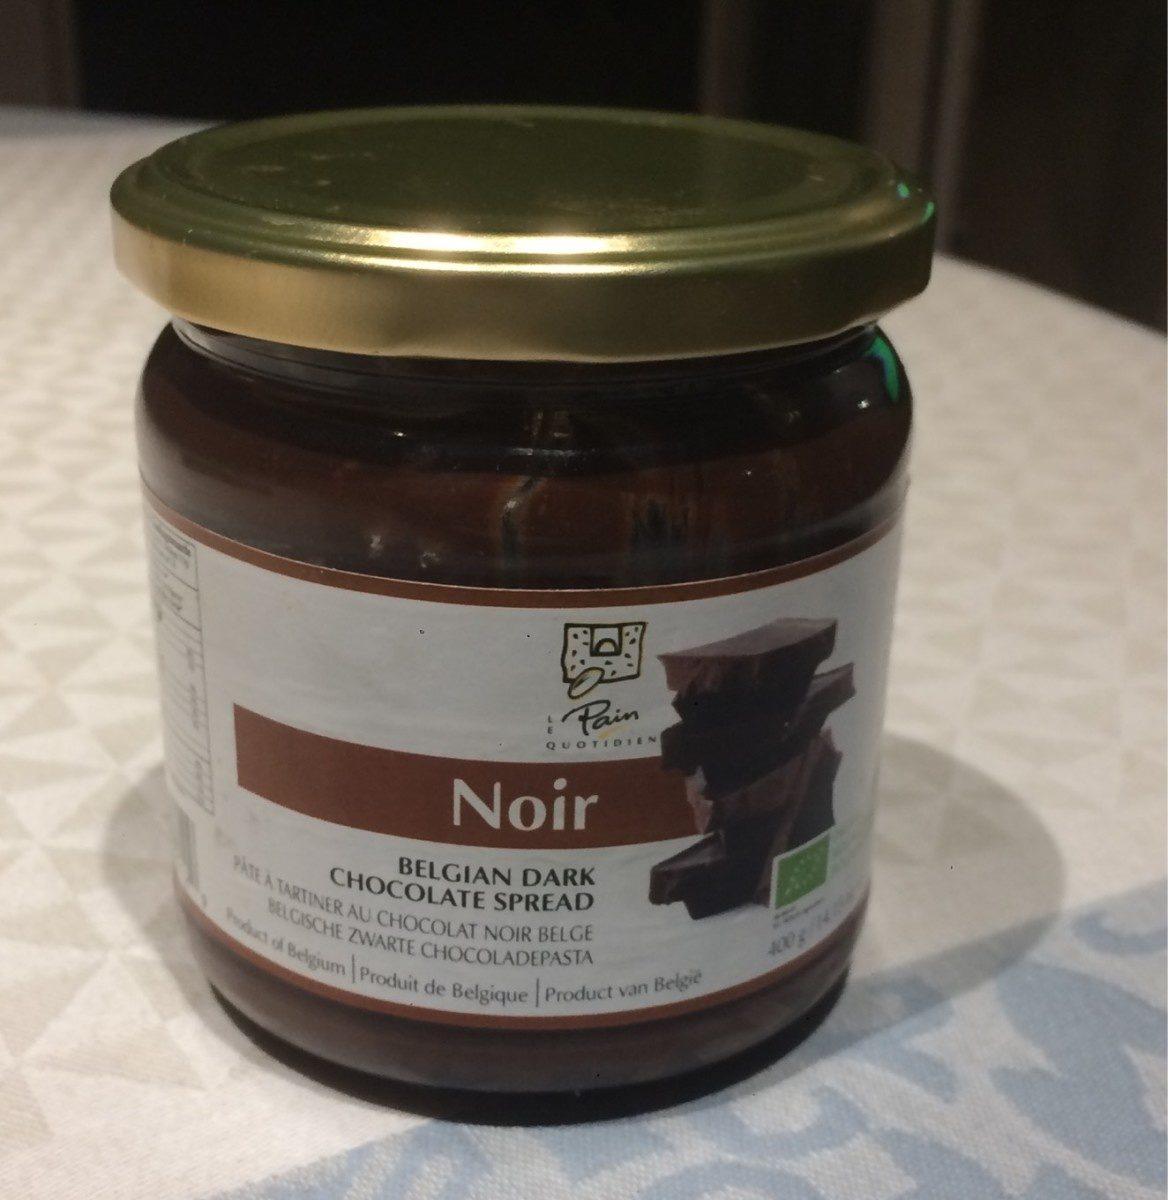 Pâte à Tartiner au Chocolat Noir Belge - Product - fr